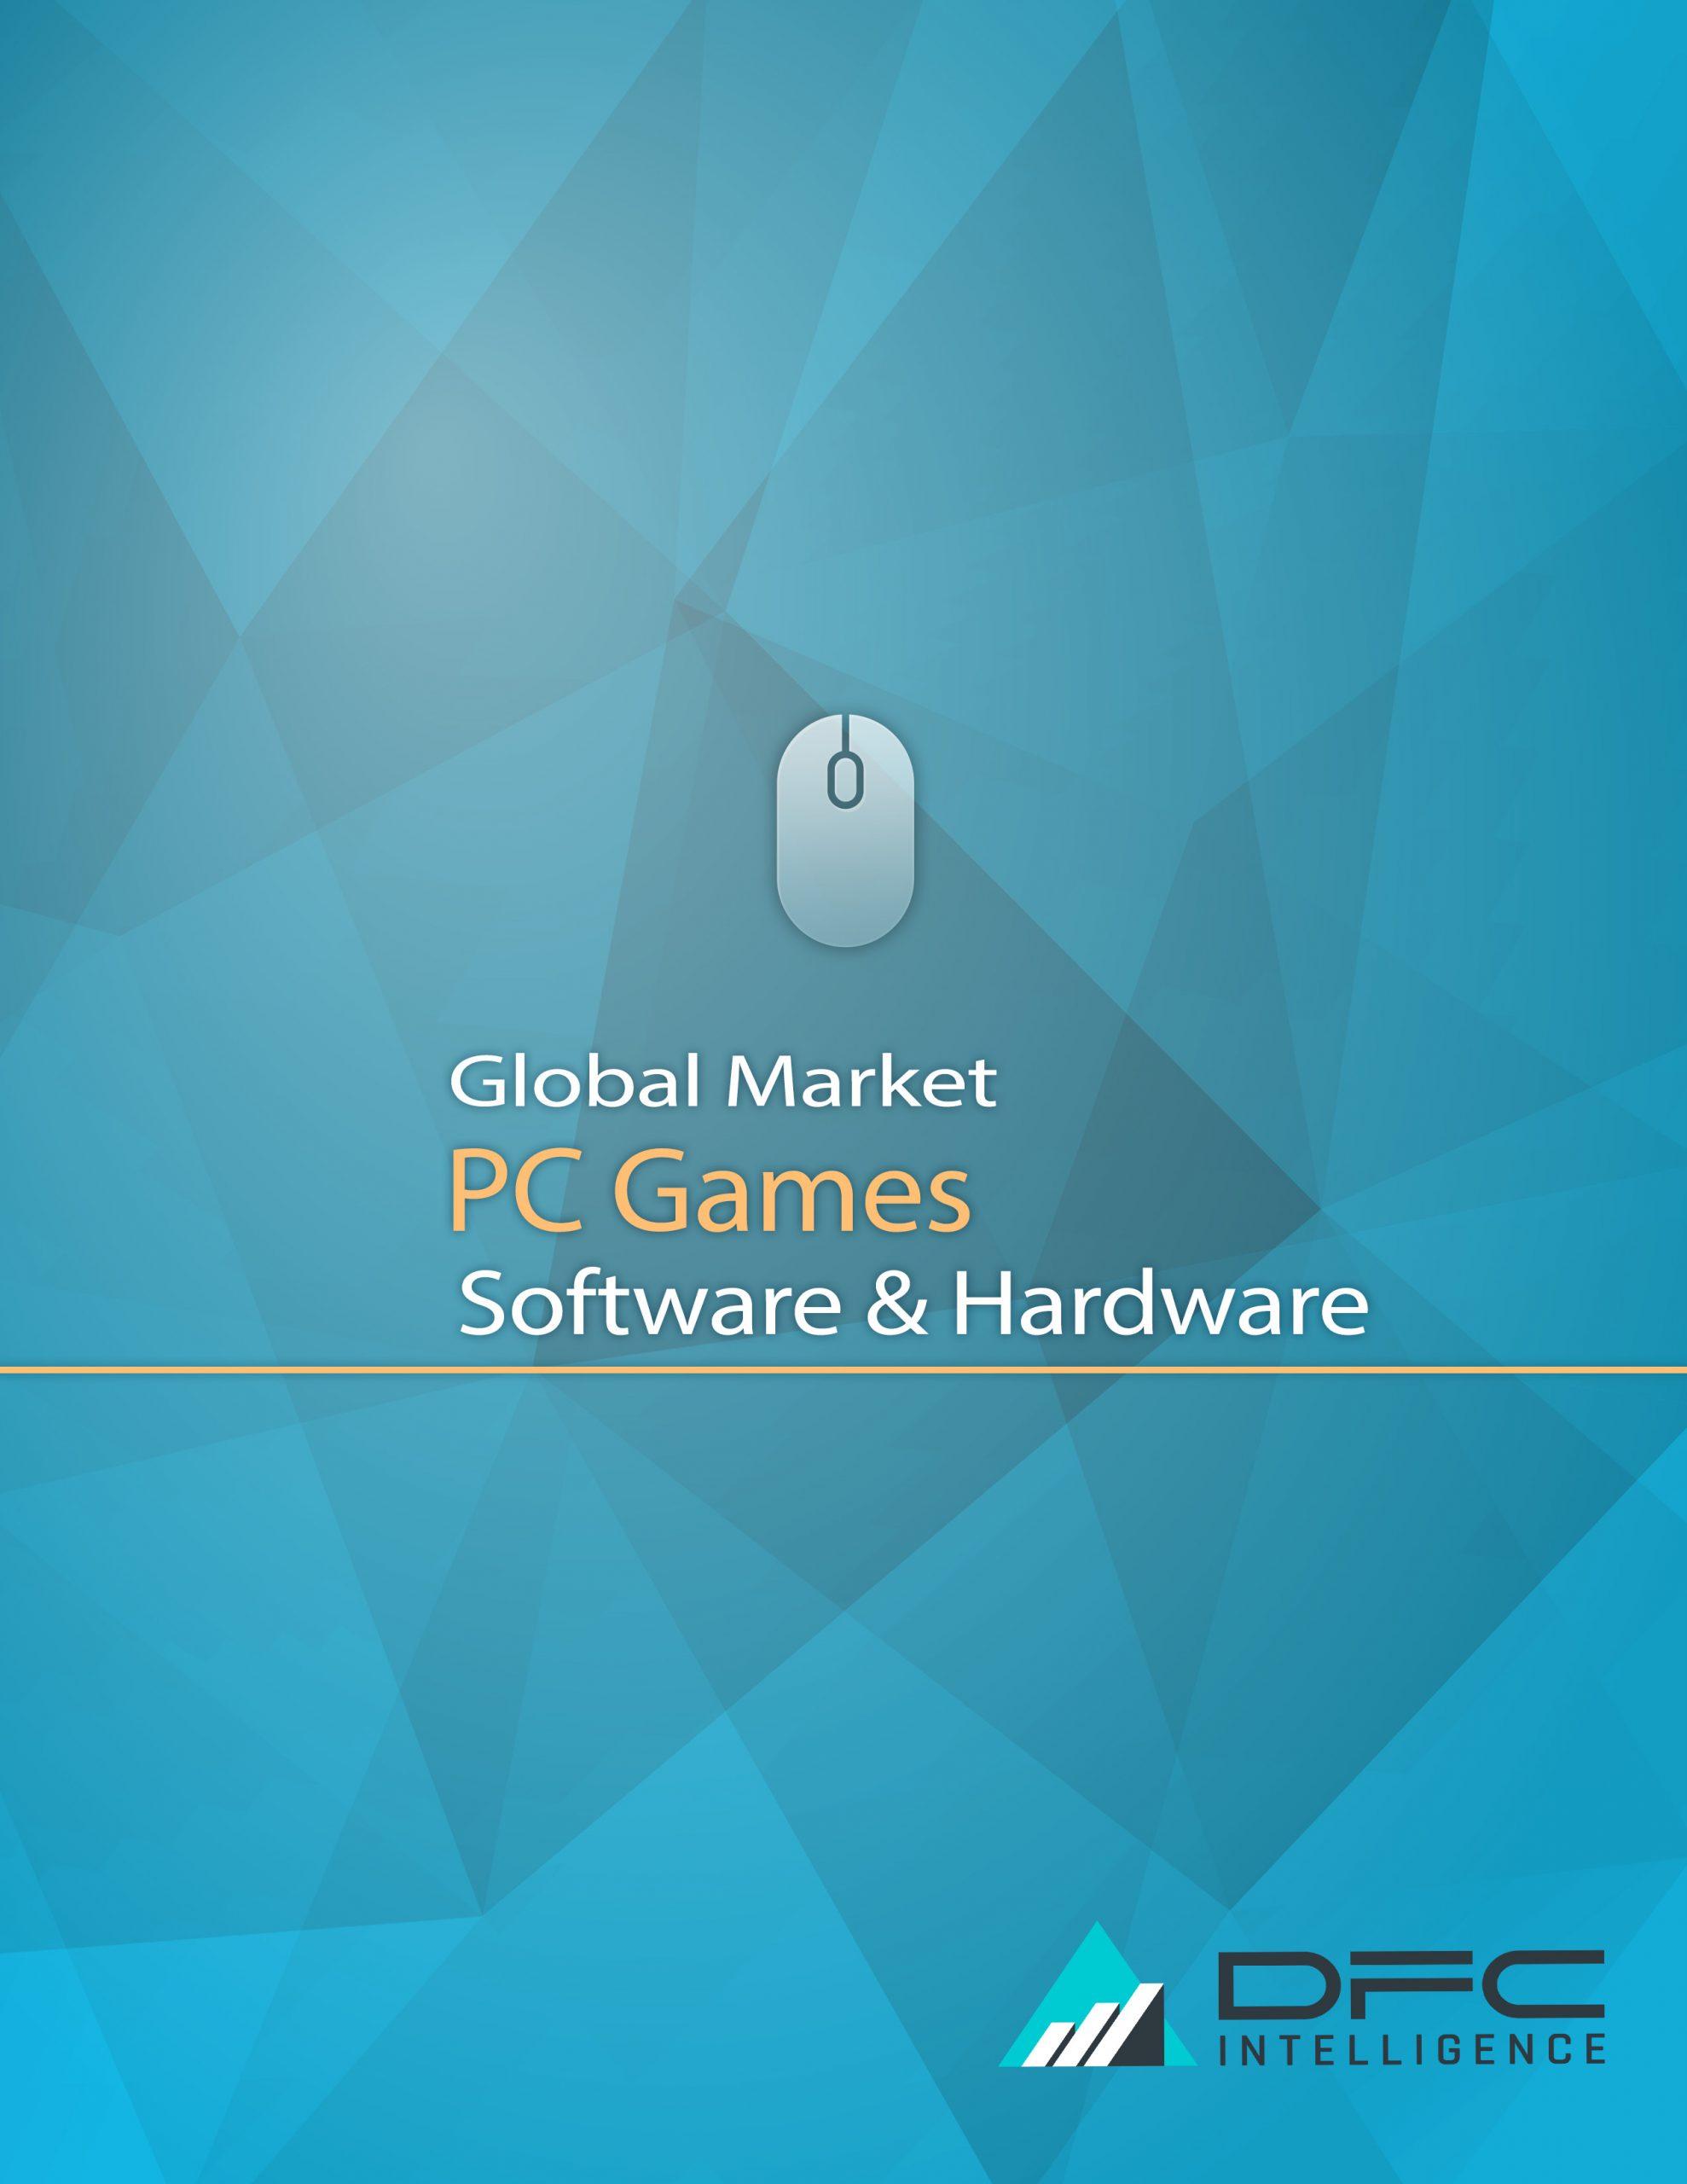 PC gaming market report